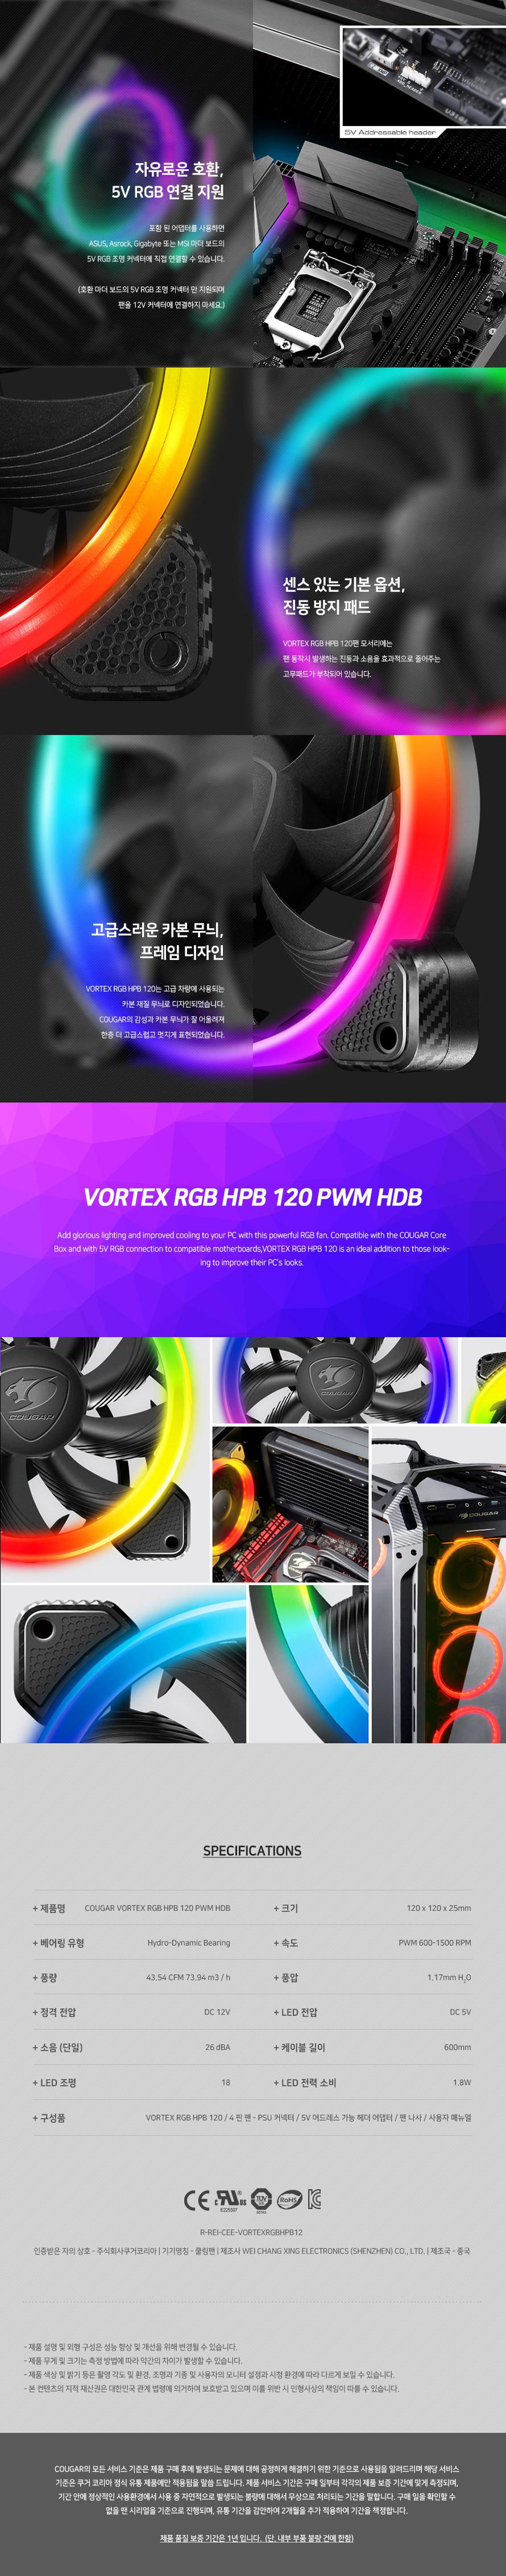 VORTEXRGBHPB120PWMHDB_4_4535.jpg